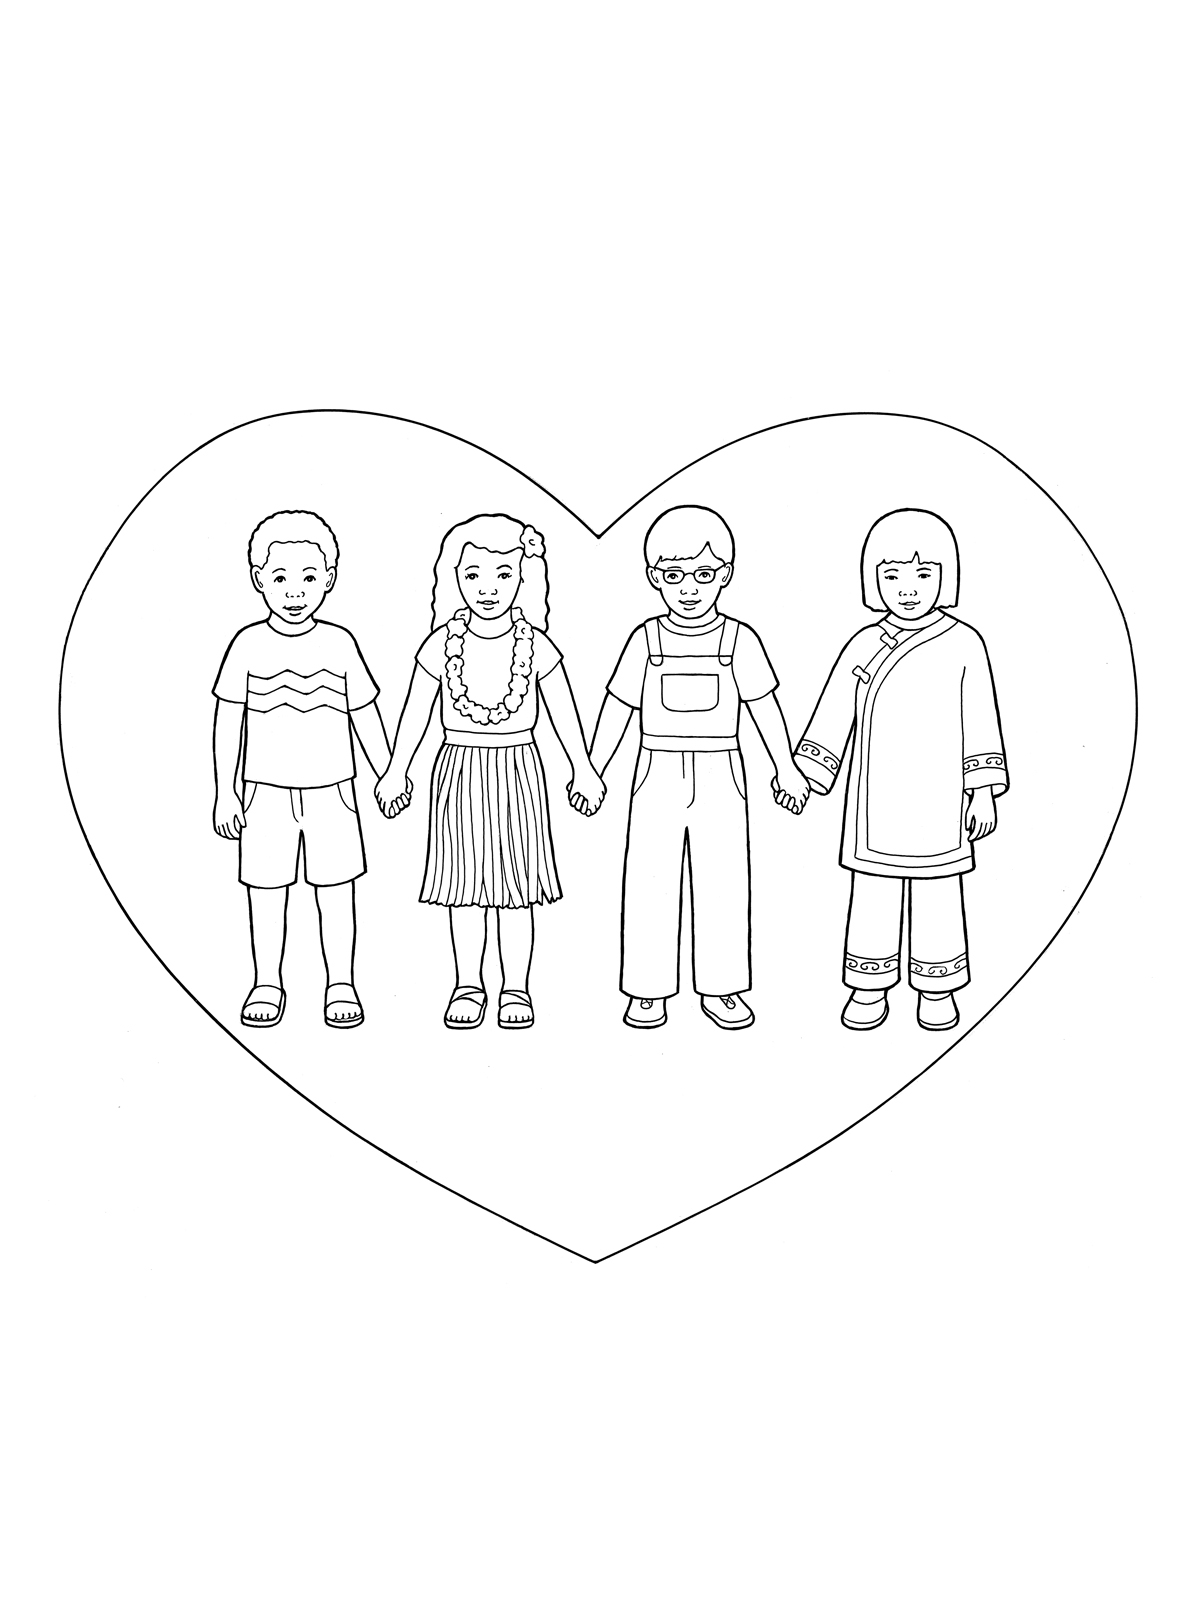 Children Holding Hands in Heart